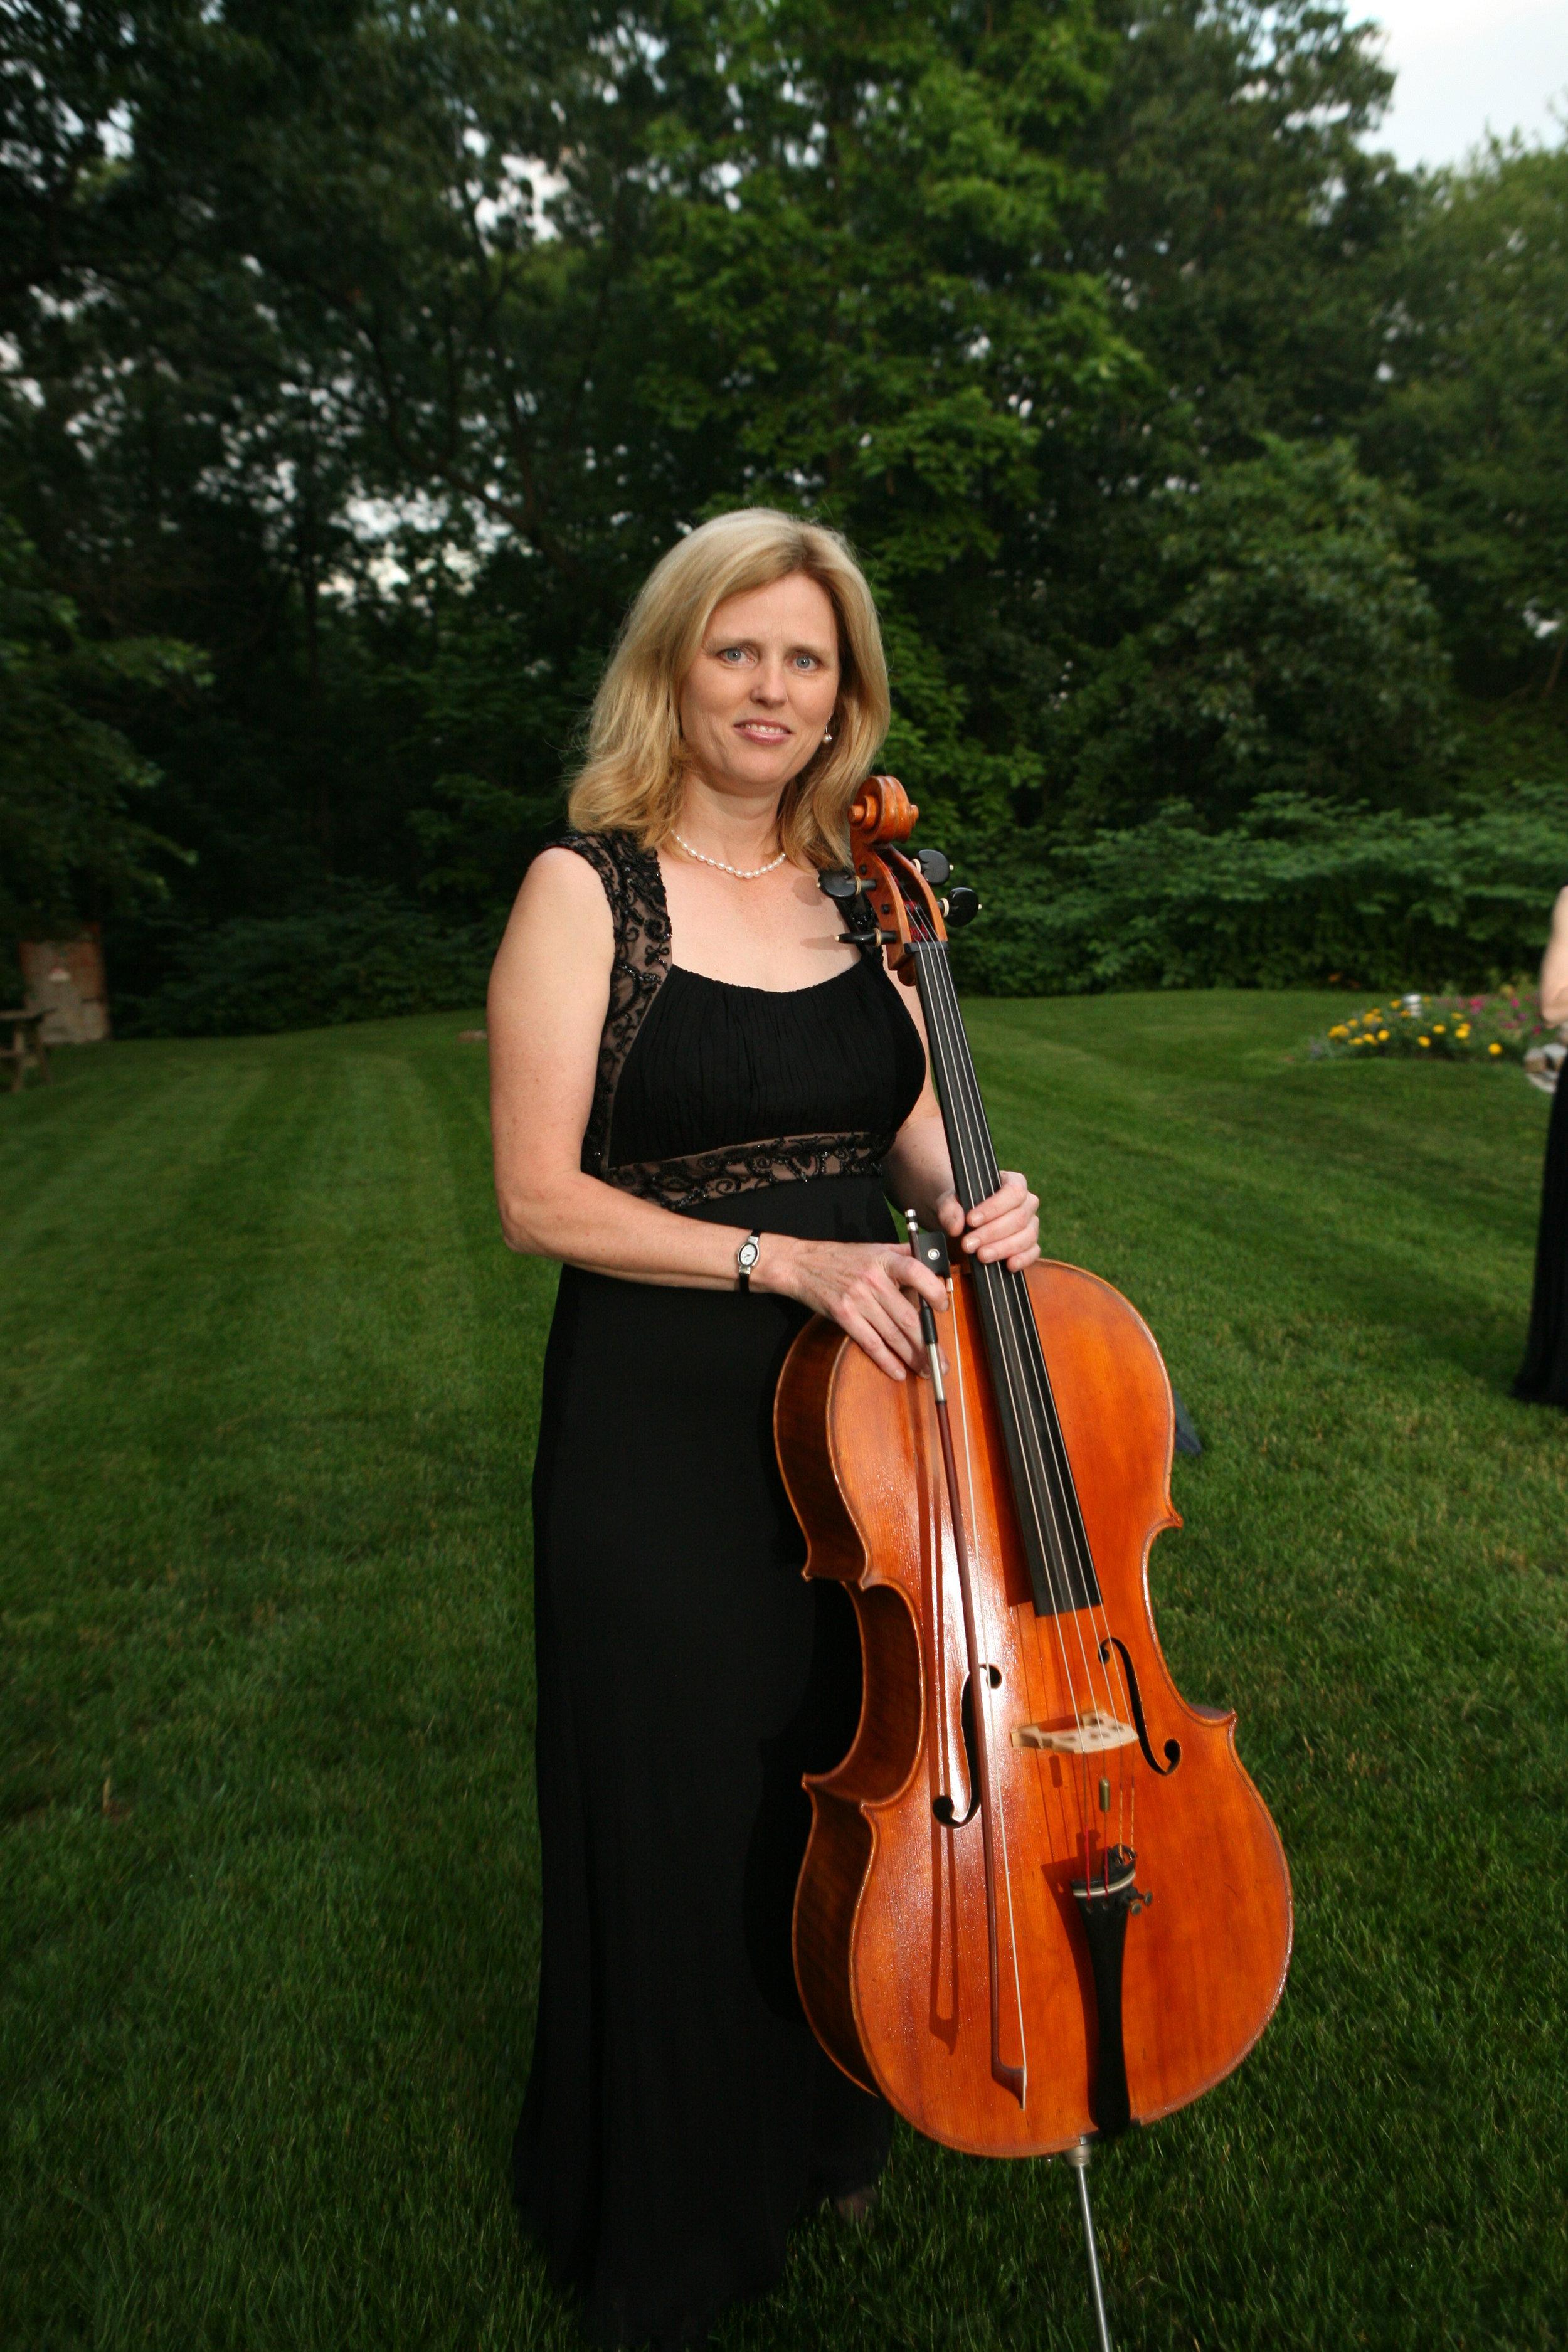 Kathy Schiano, cellist